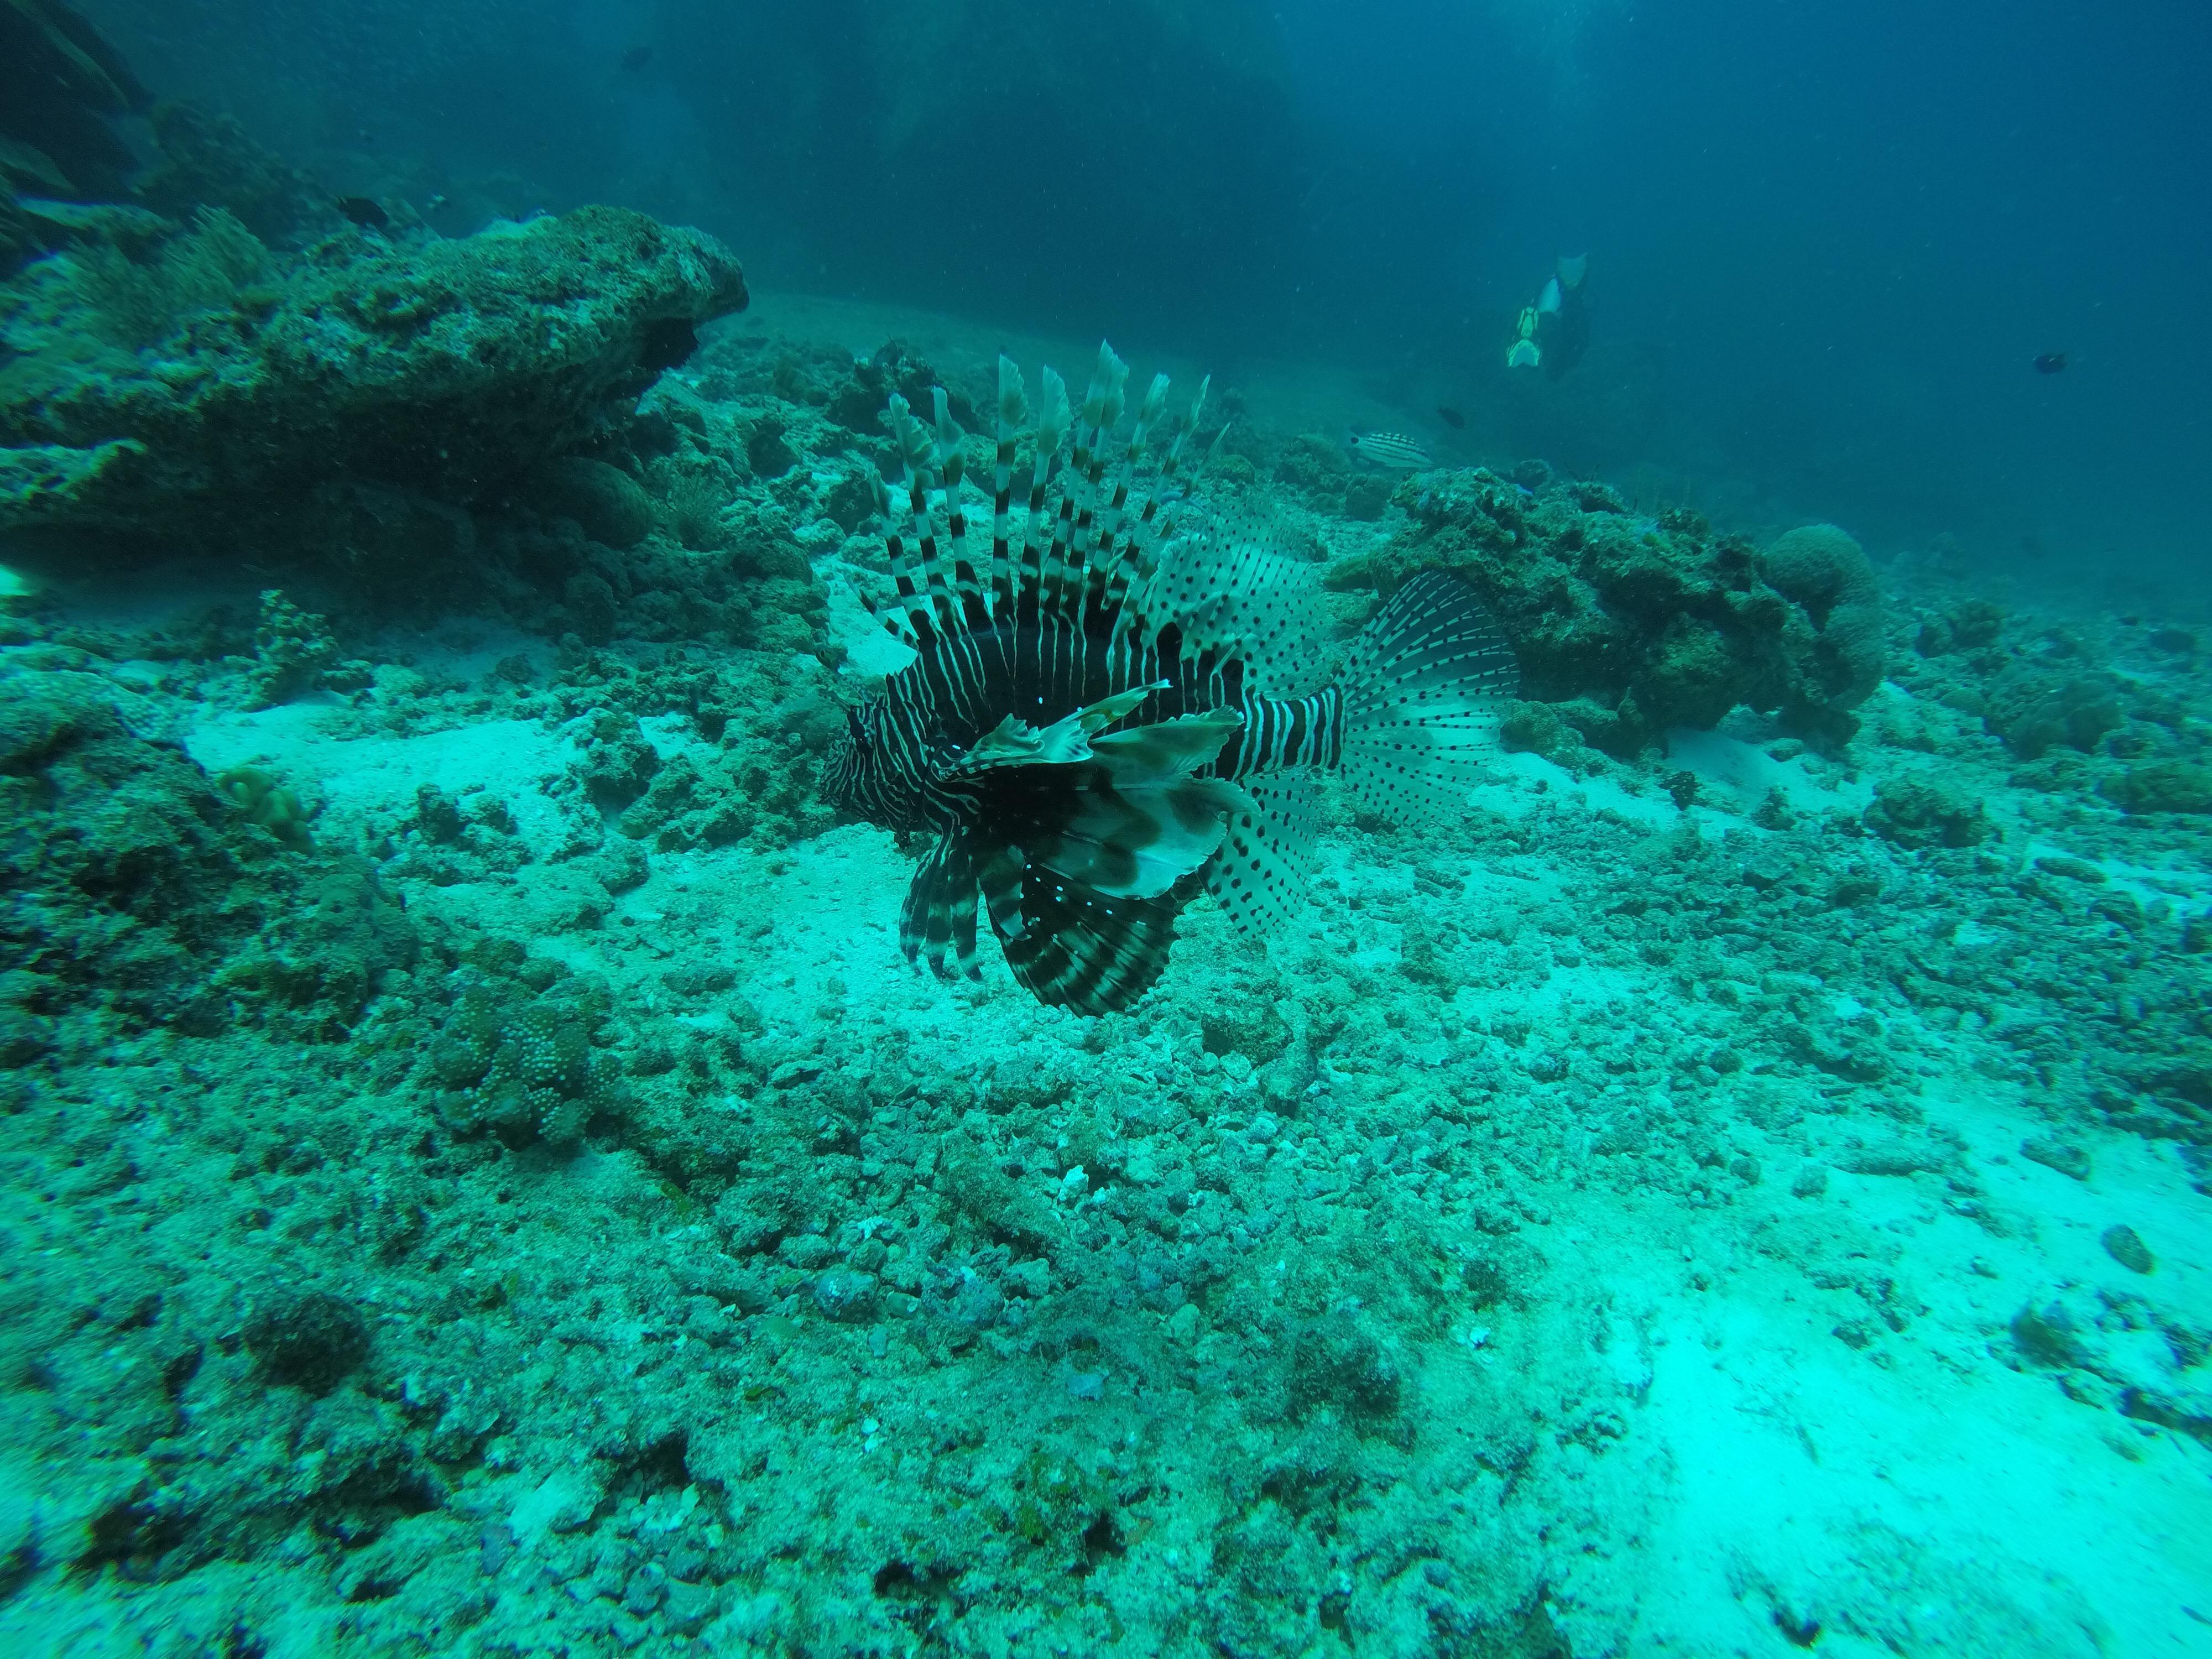 visita_tecnica_subaquatica_parque_marinho_ilhas_similan_peixe_leao